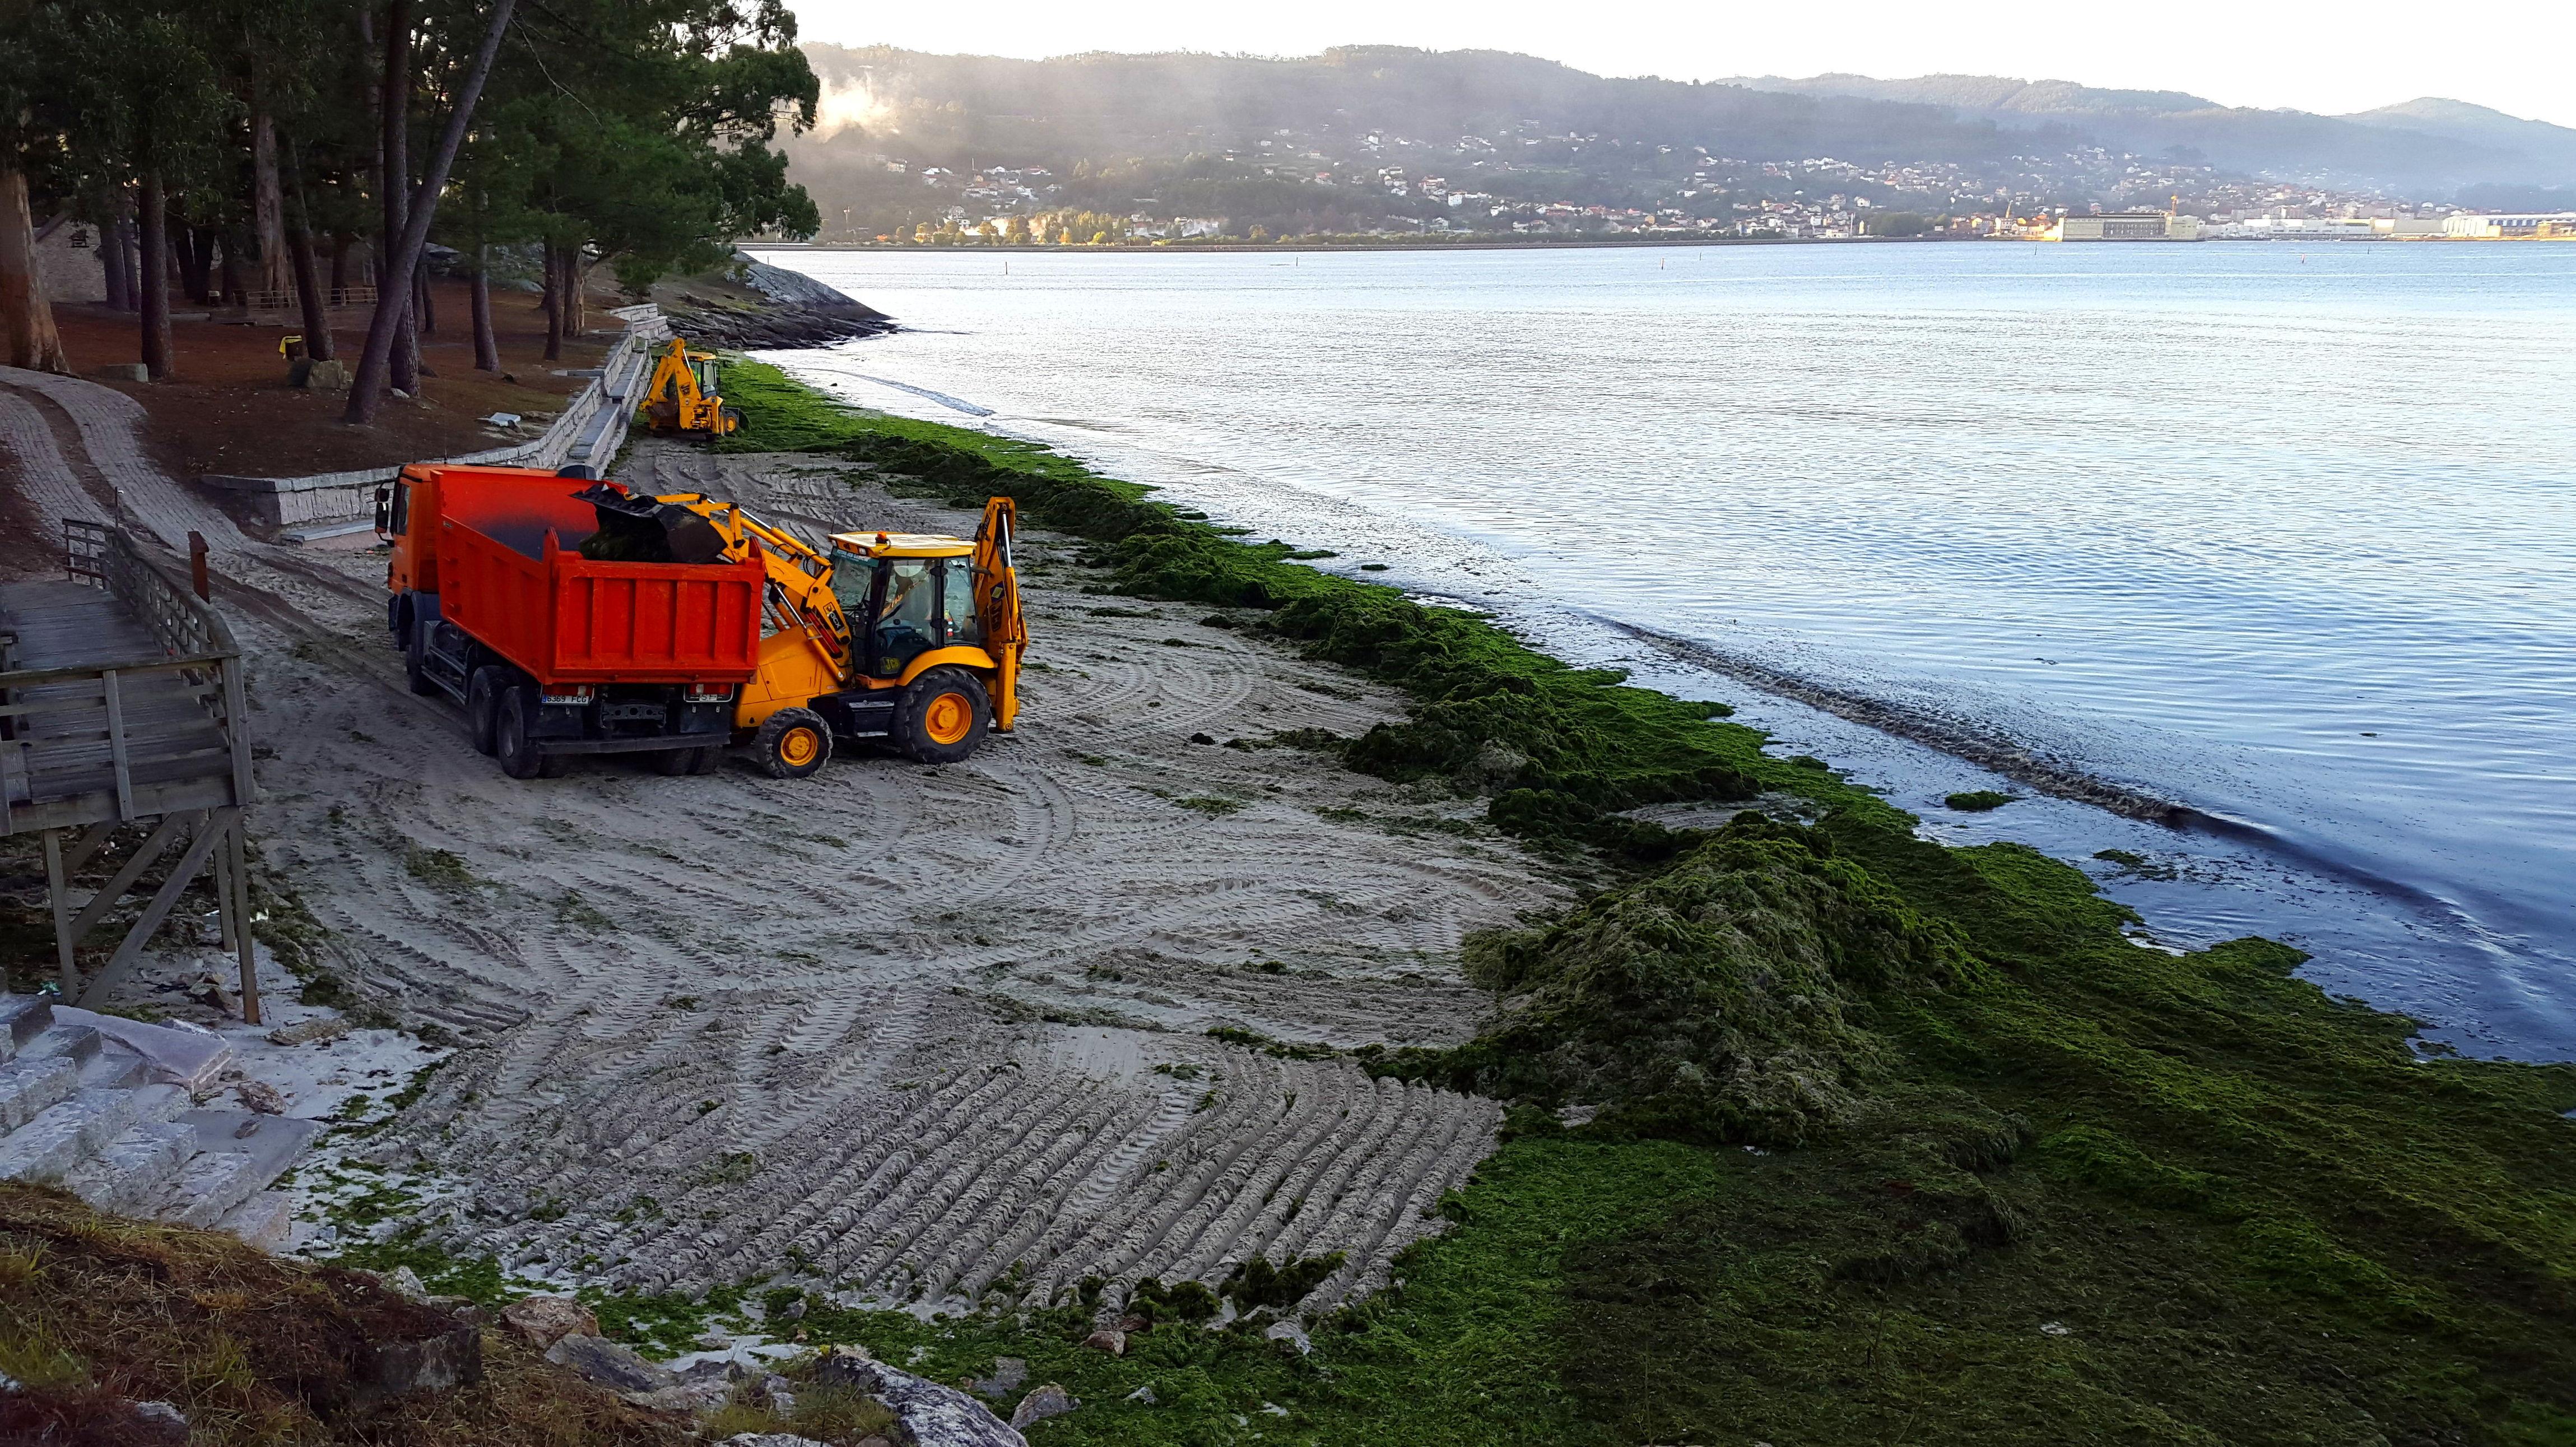 limpieza de la playa de lourido - Poio